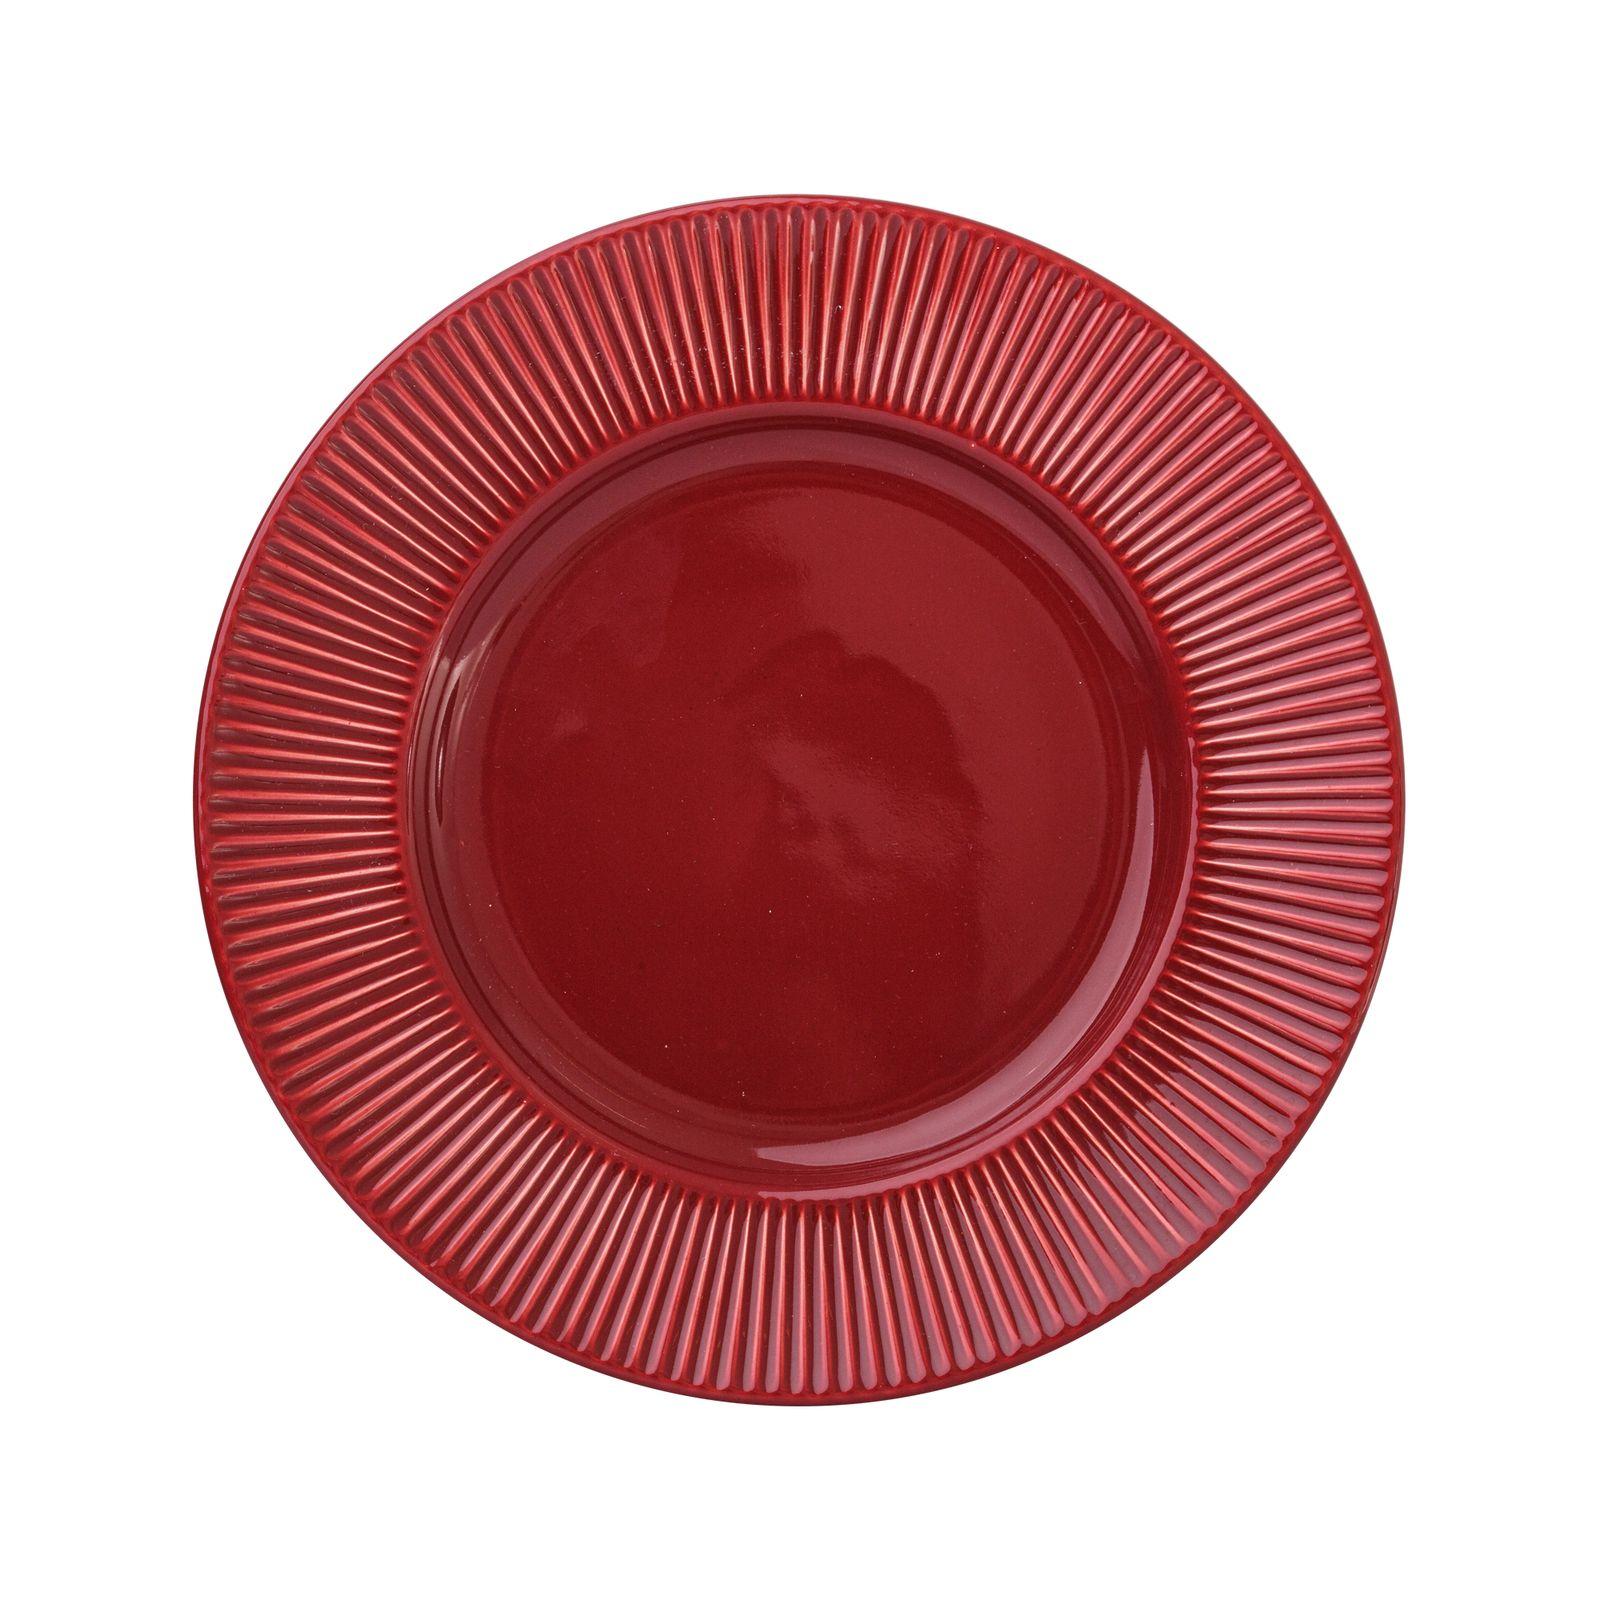 Talerz obiadowy Palette Cherry 27 cm AMBITION